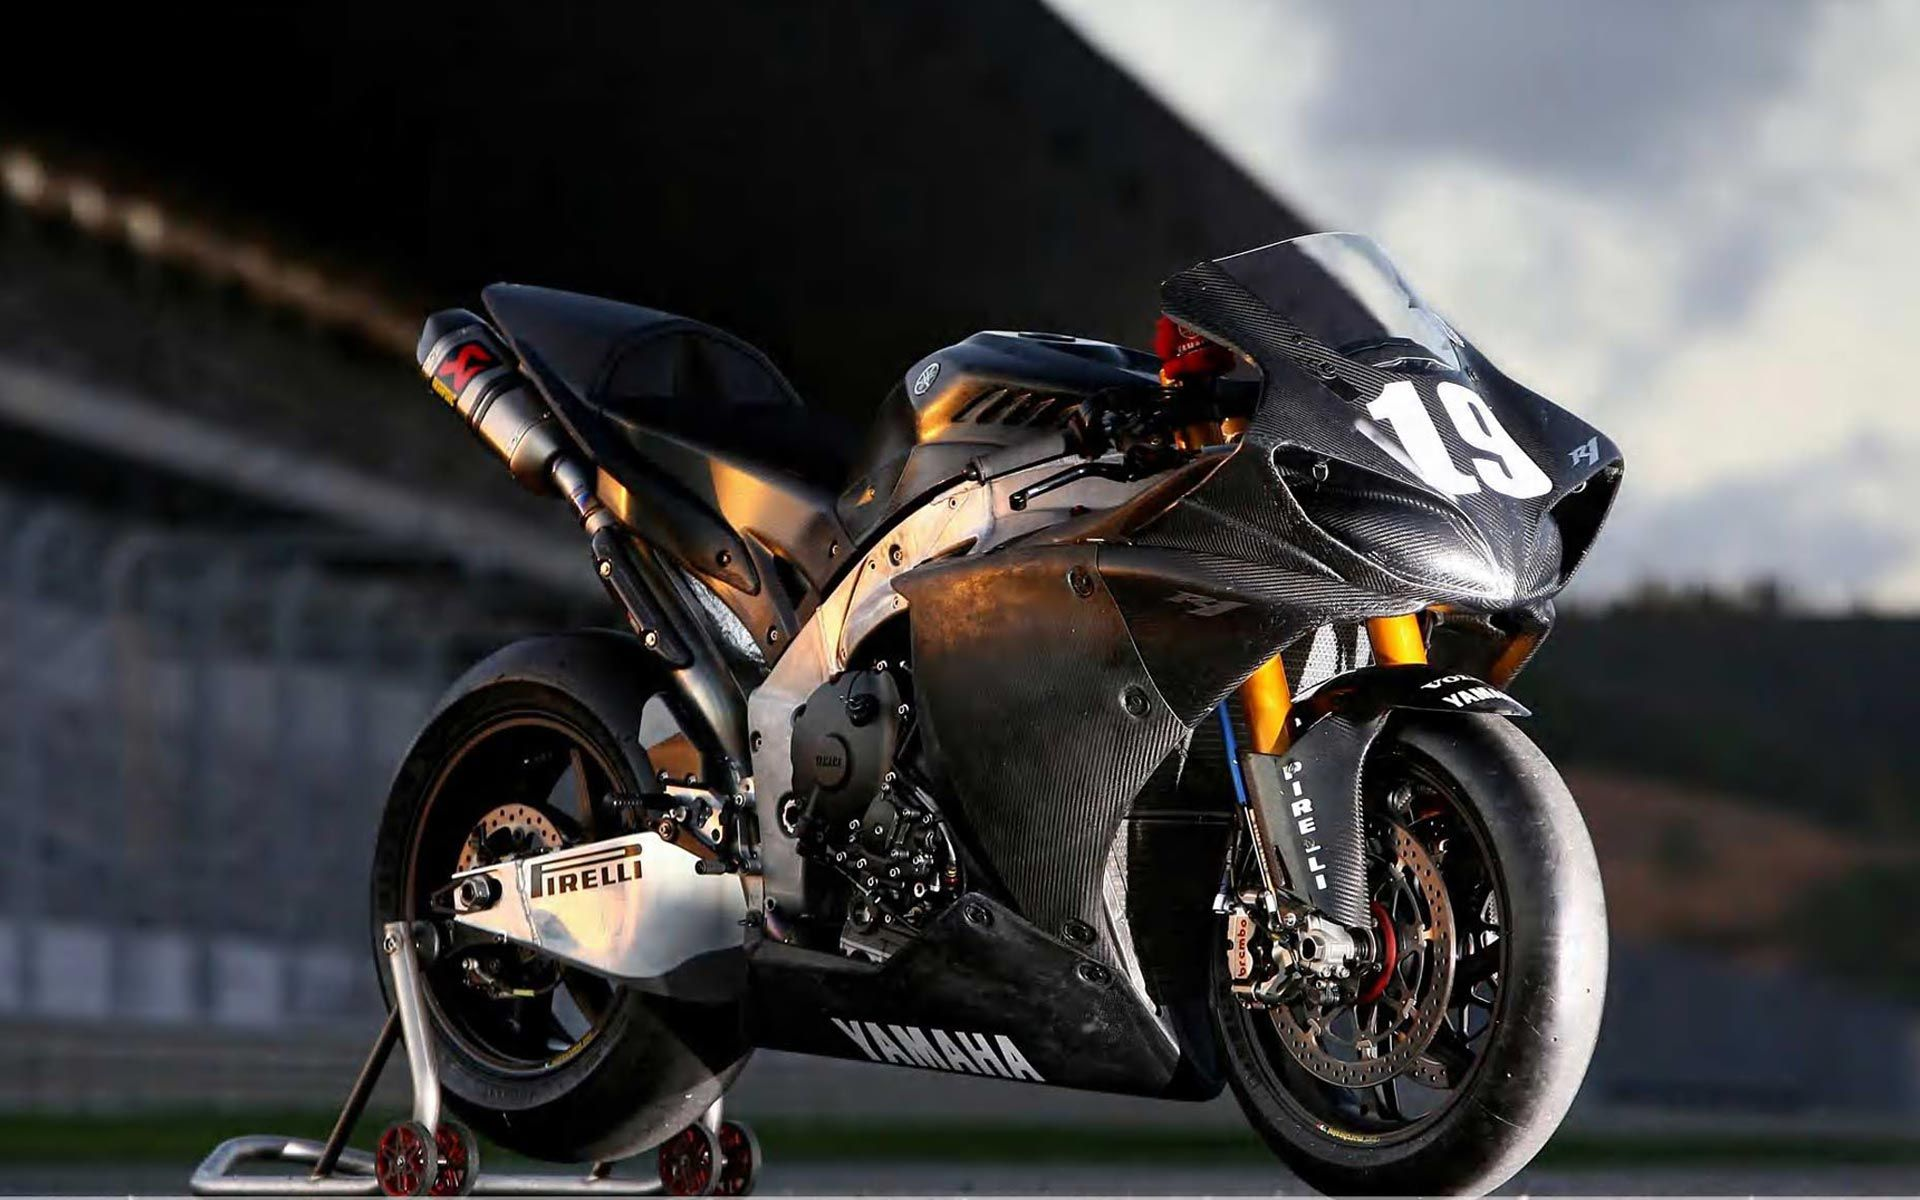 Wallpaper Yamaha Fz 10 Sportbikes 2017 Bikes Yamaha Hd: Yamaha YZF R1 Pirelli Hd Wallpaper